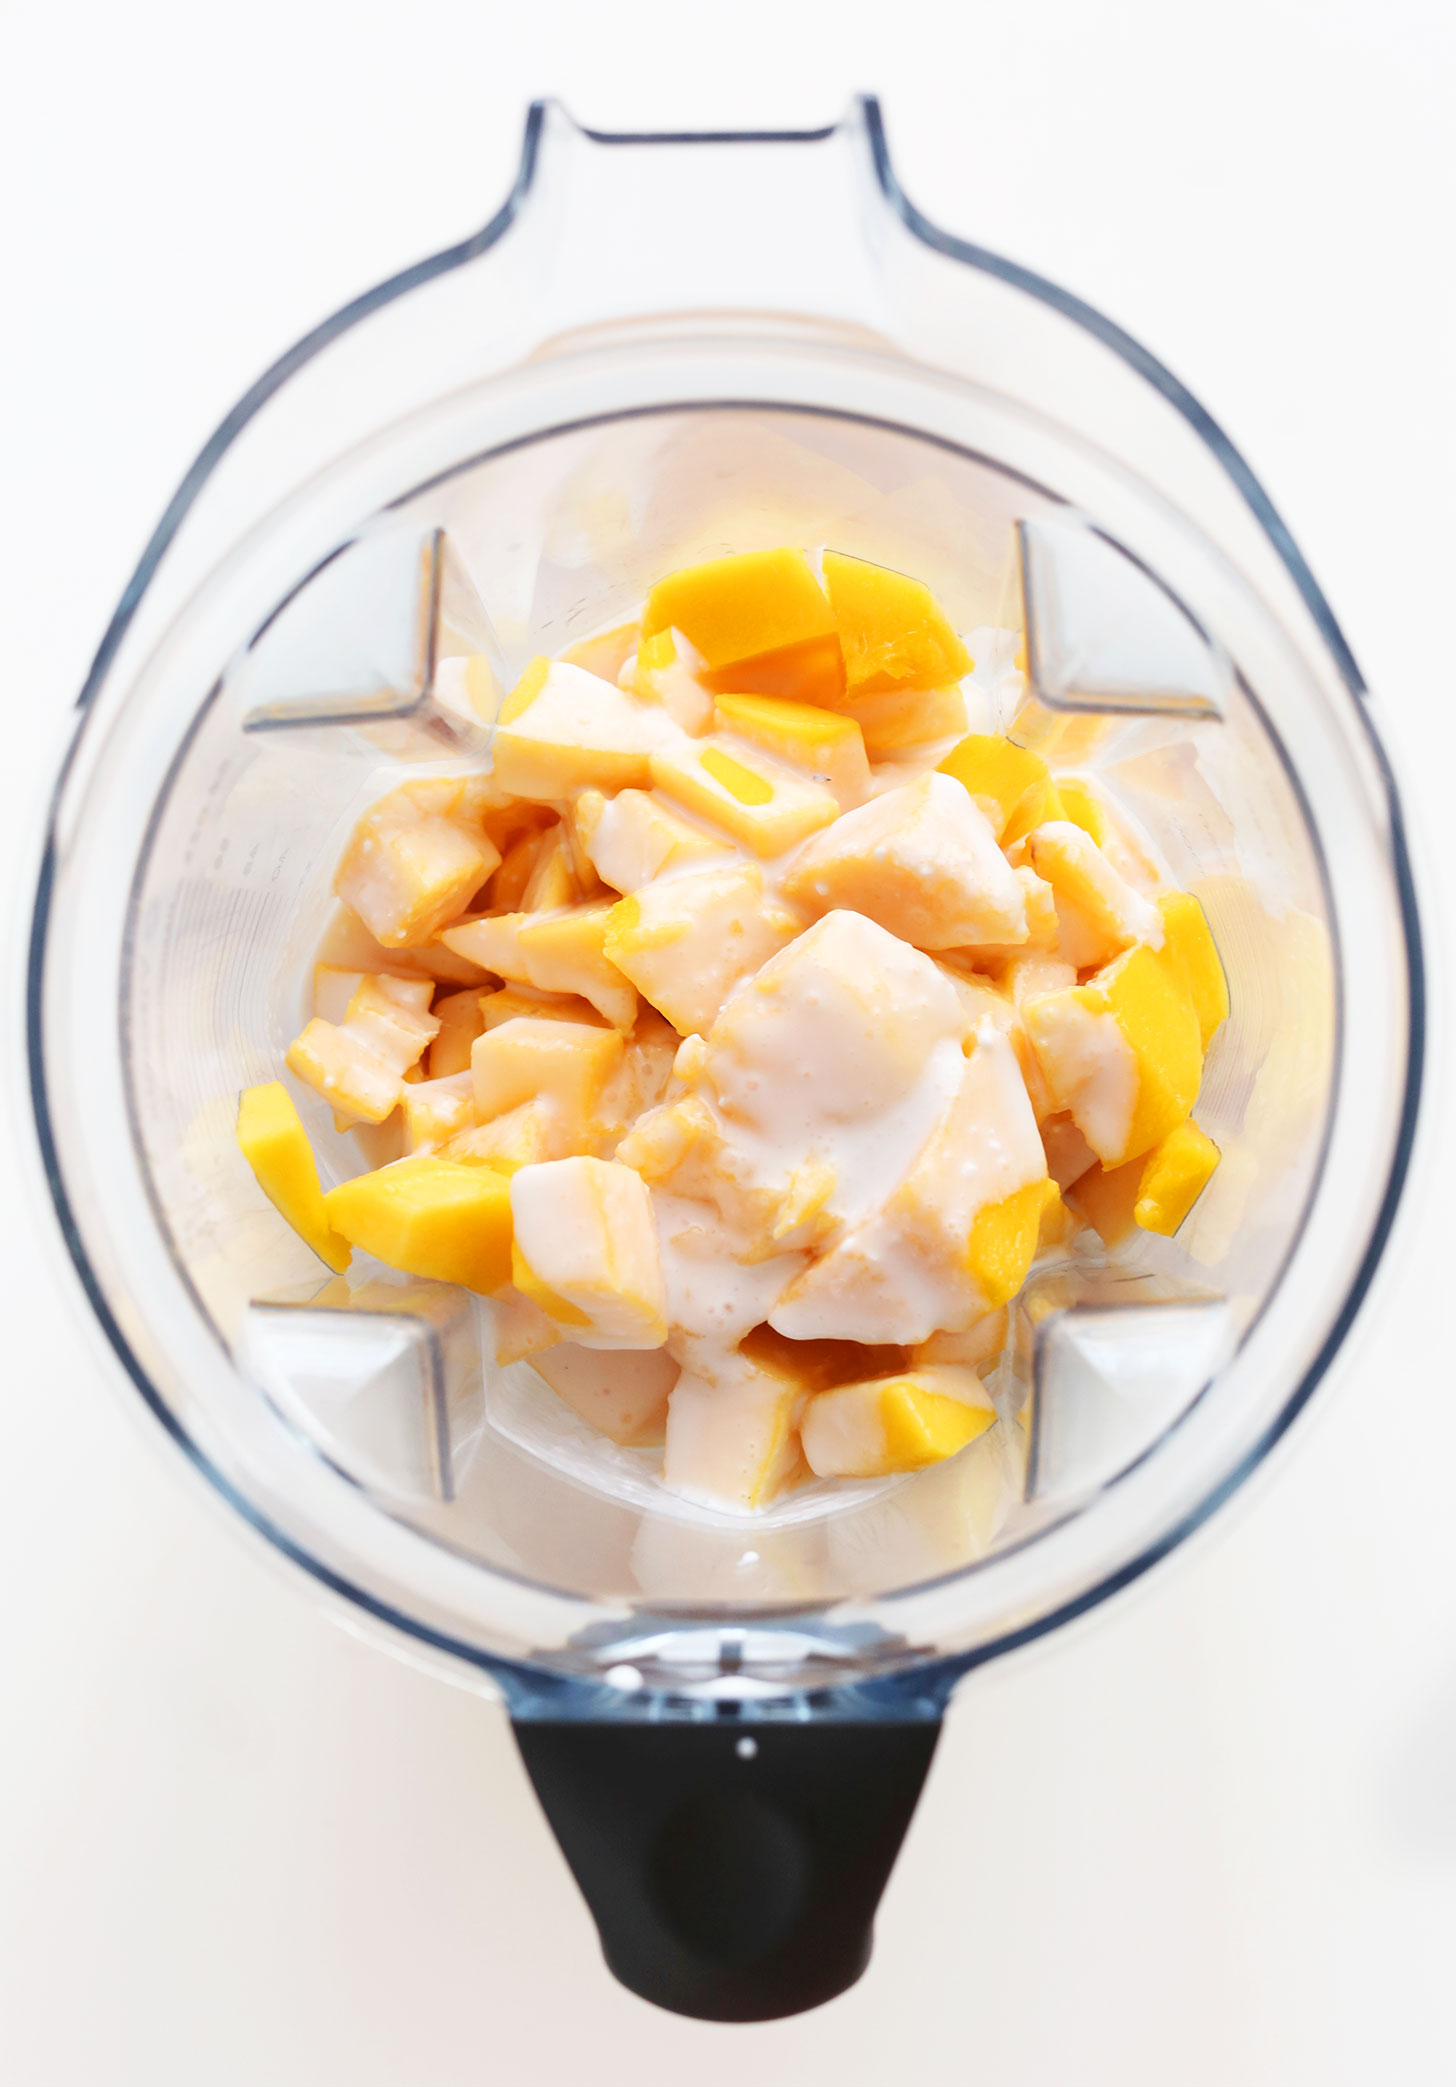 AMAZING Creamy Mango Raspberry COCONUT Sorbet! #vegan #glutenfree #recipe #summer #sorbet #minimalistbaker